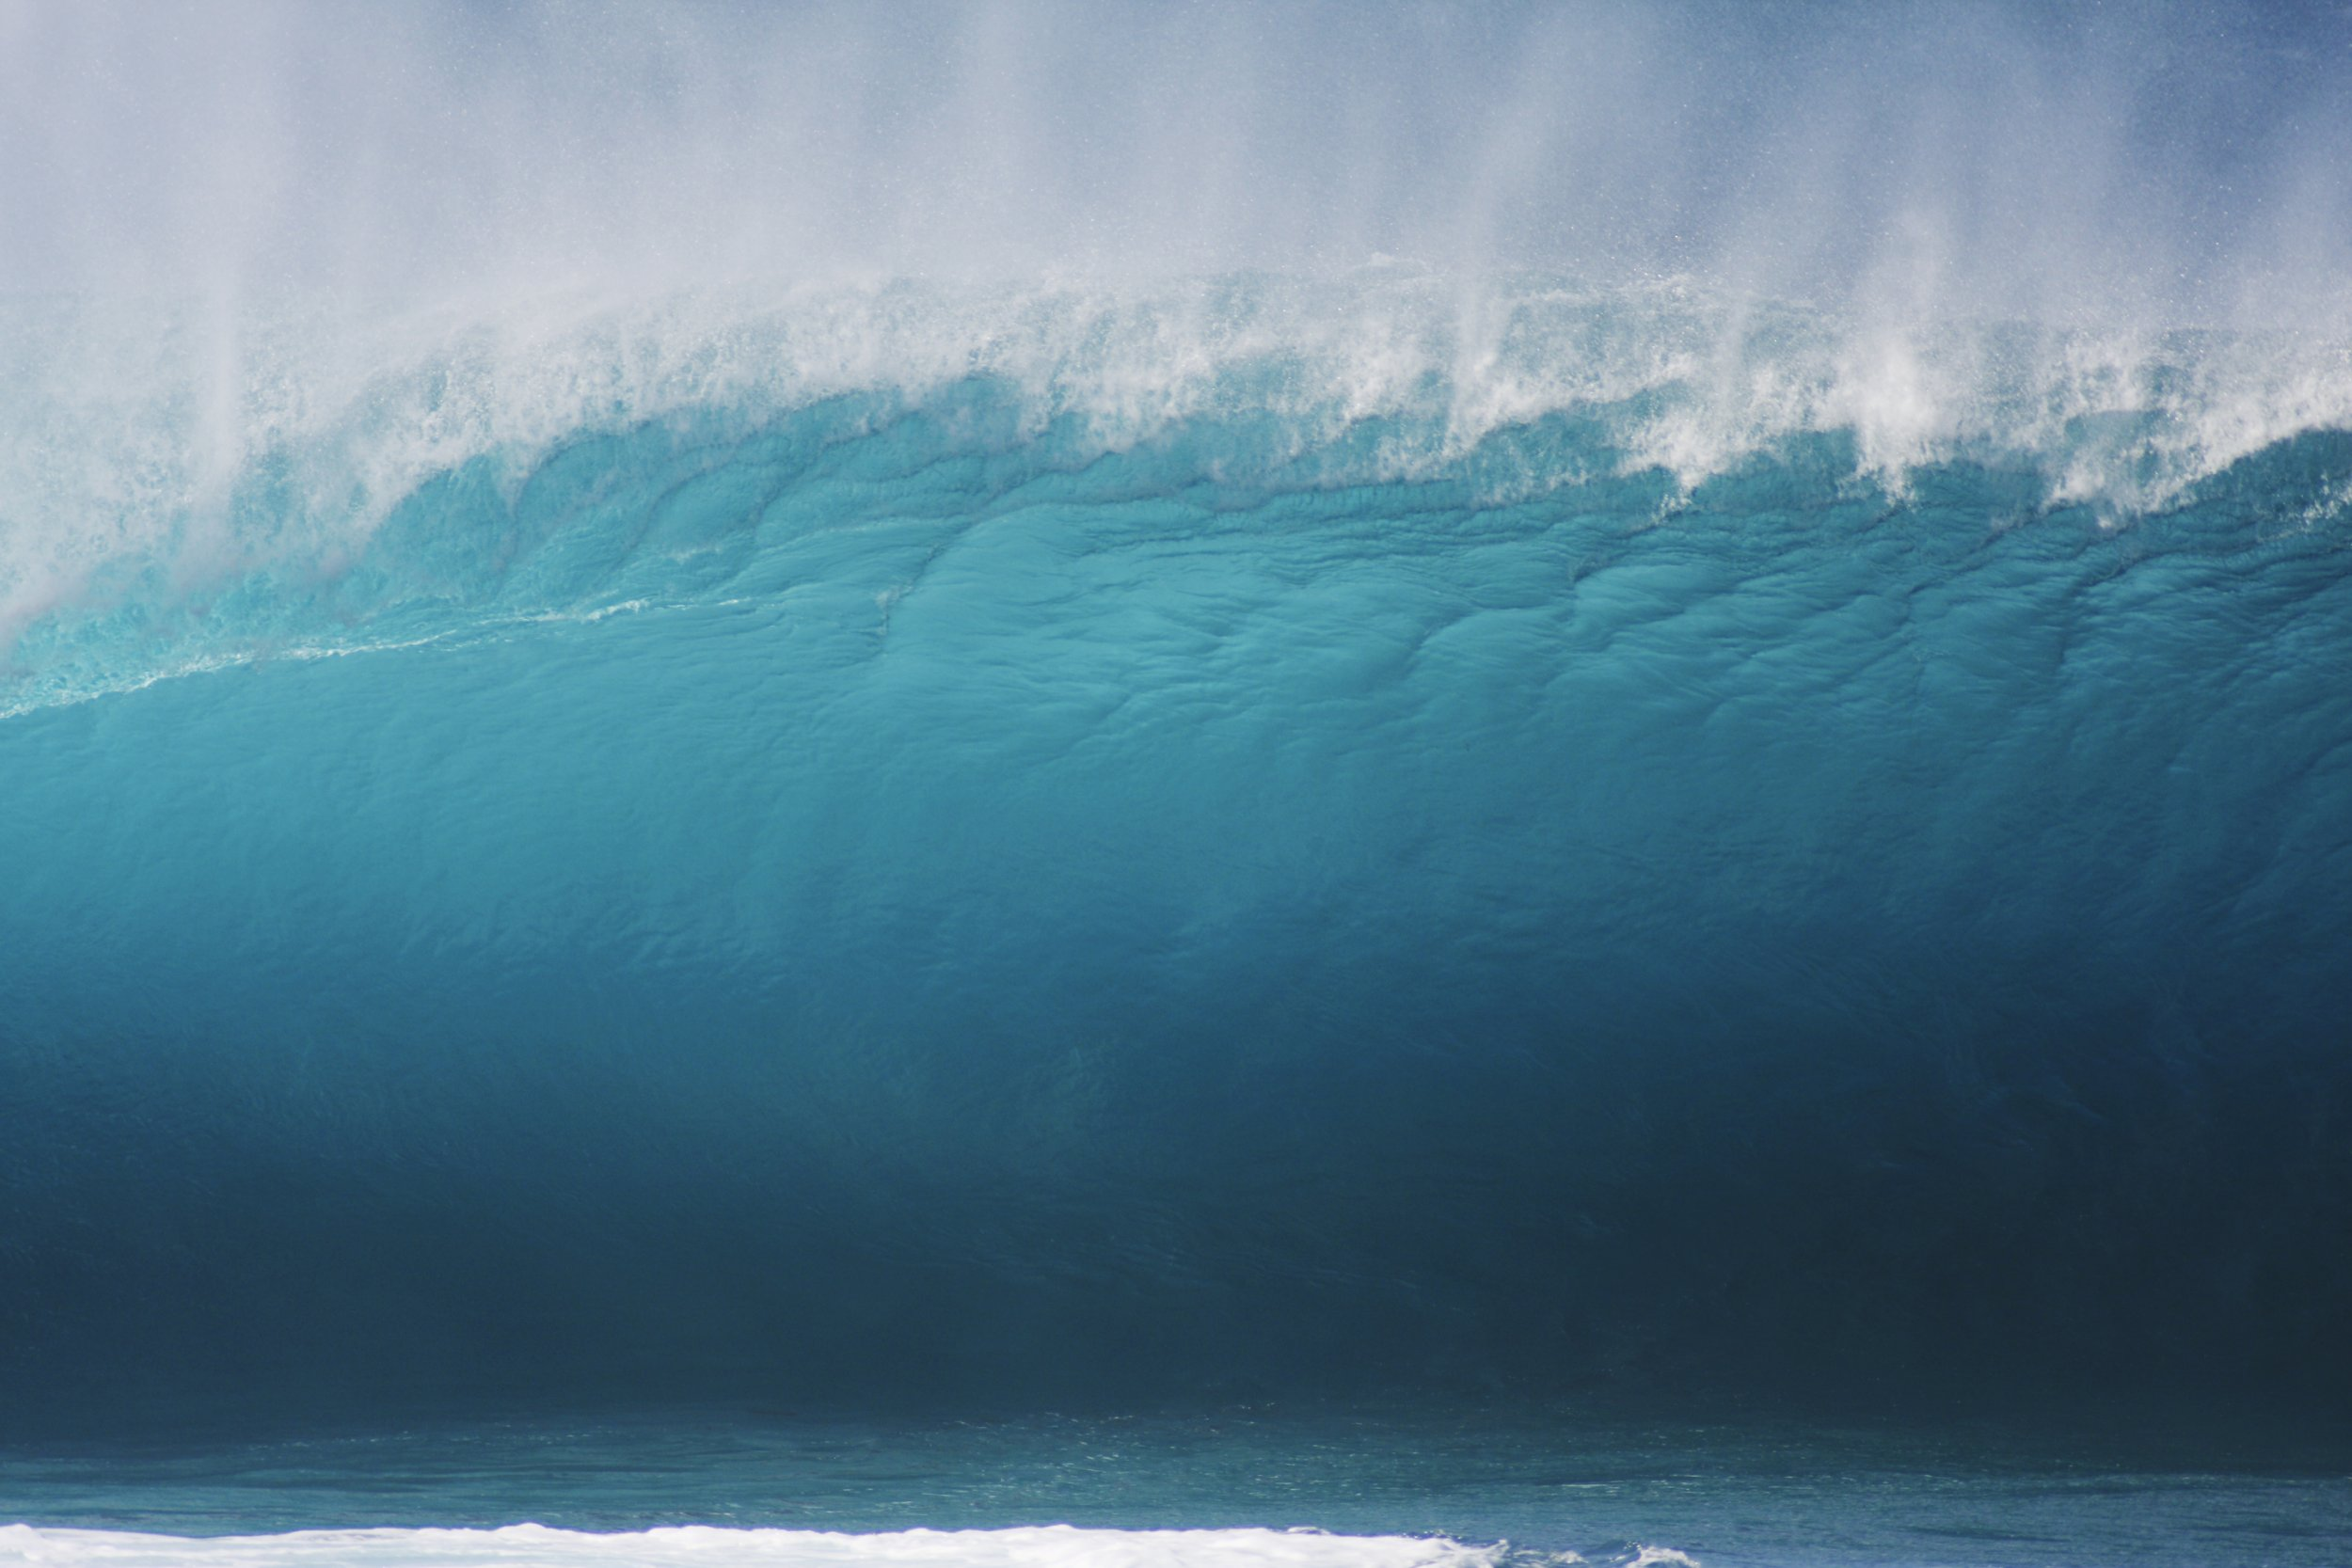 mega tsunamis can cause